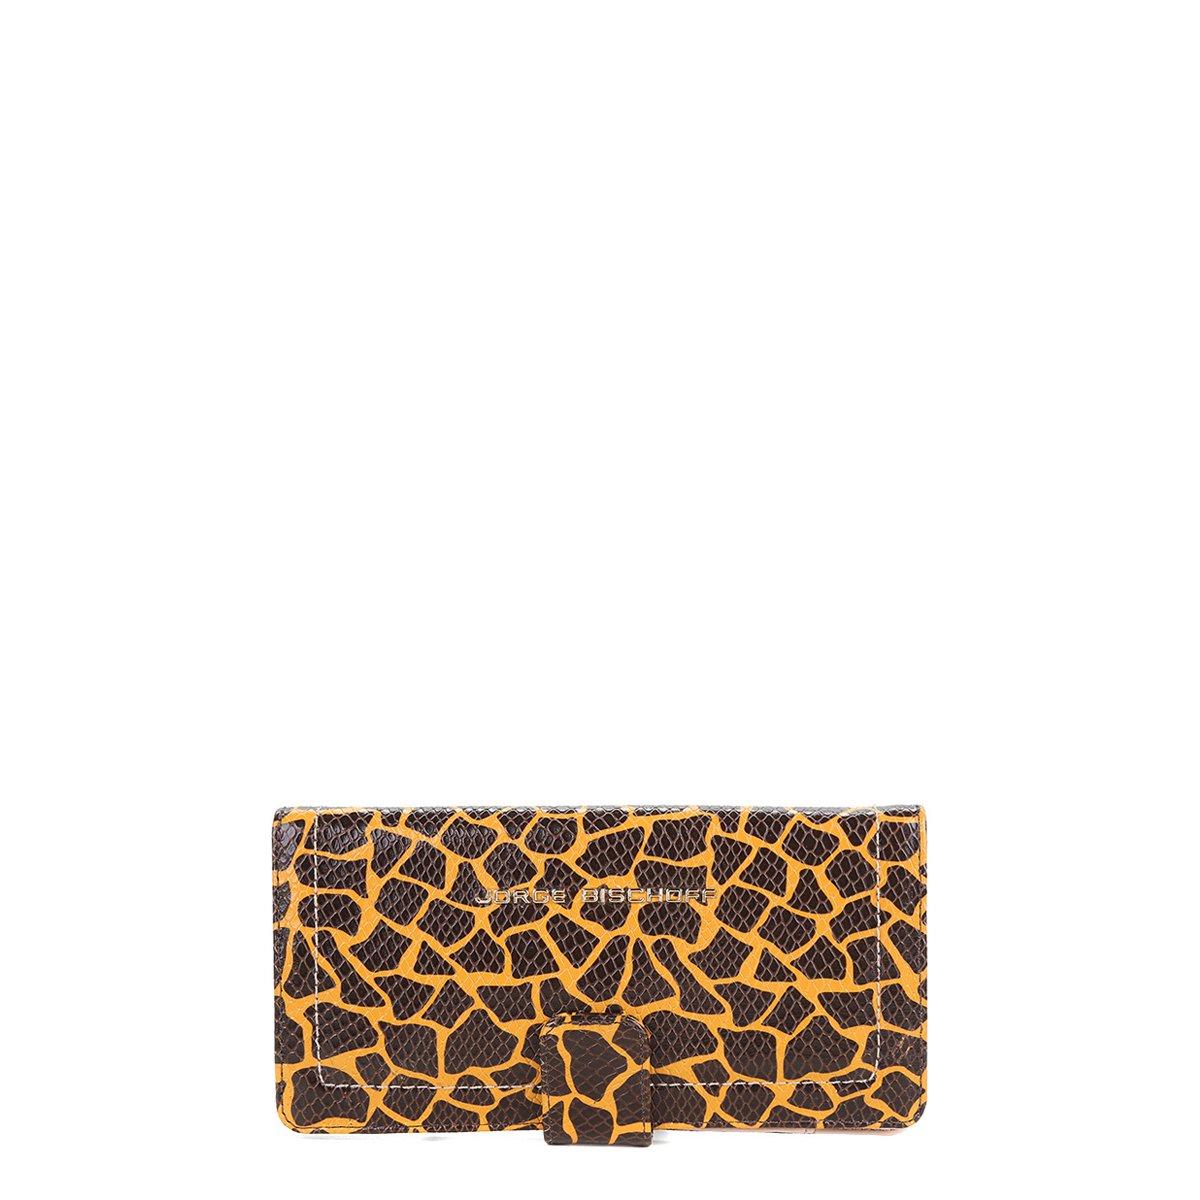 0894da420 Carteira Couro Jorge Bischoff Girafa Feminina - Compre Agora | Netshoes